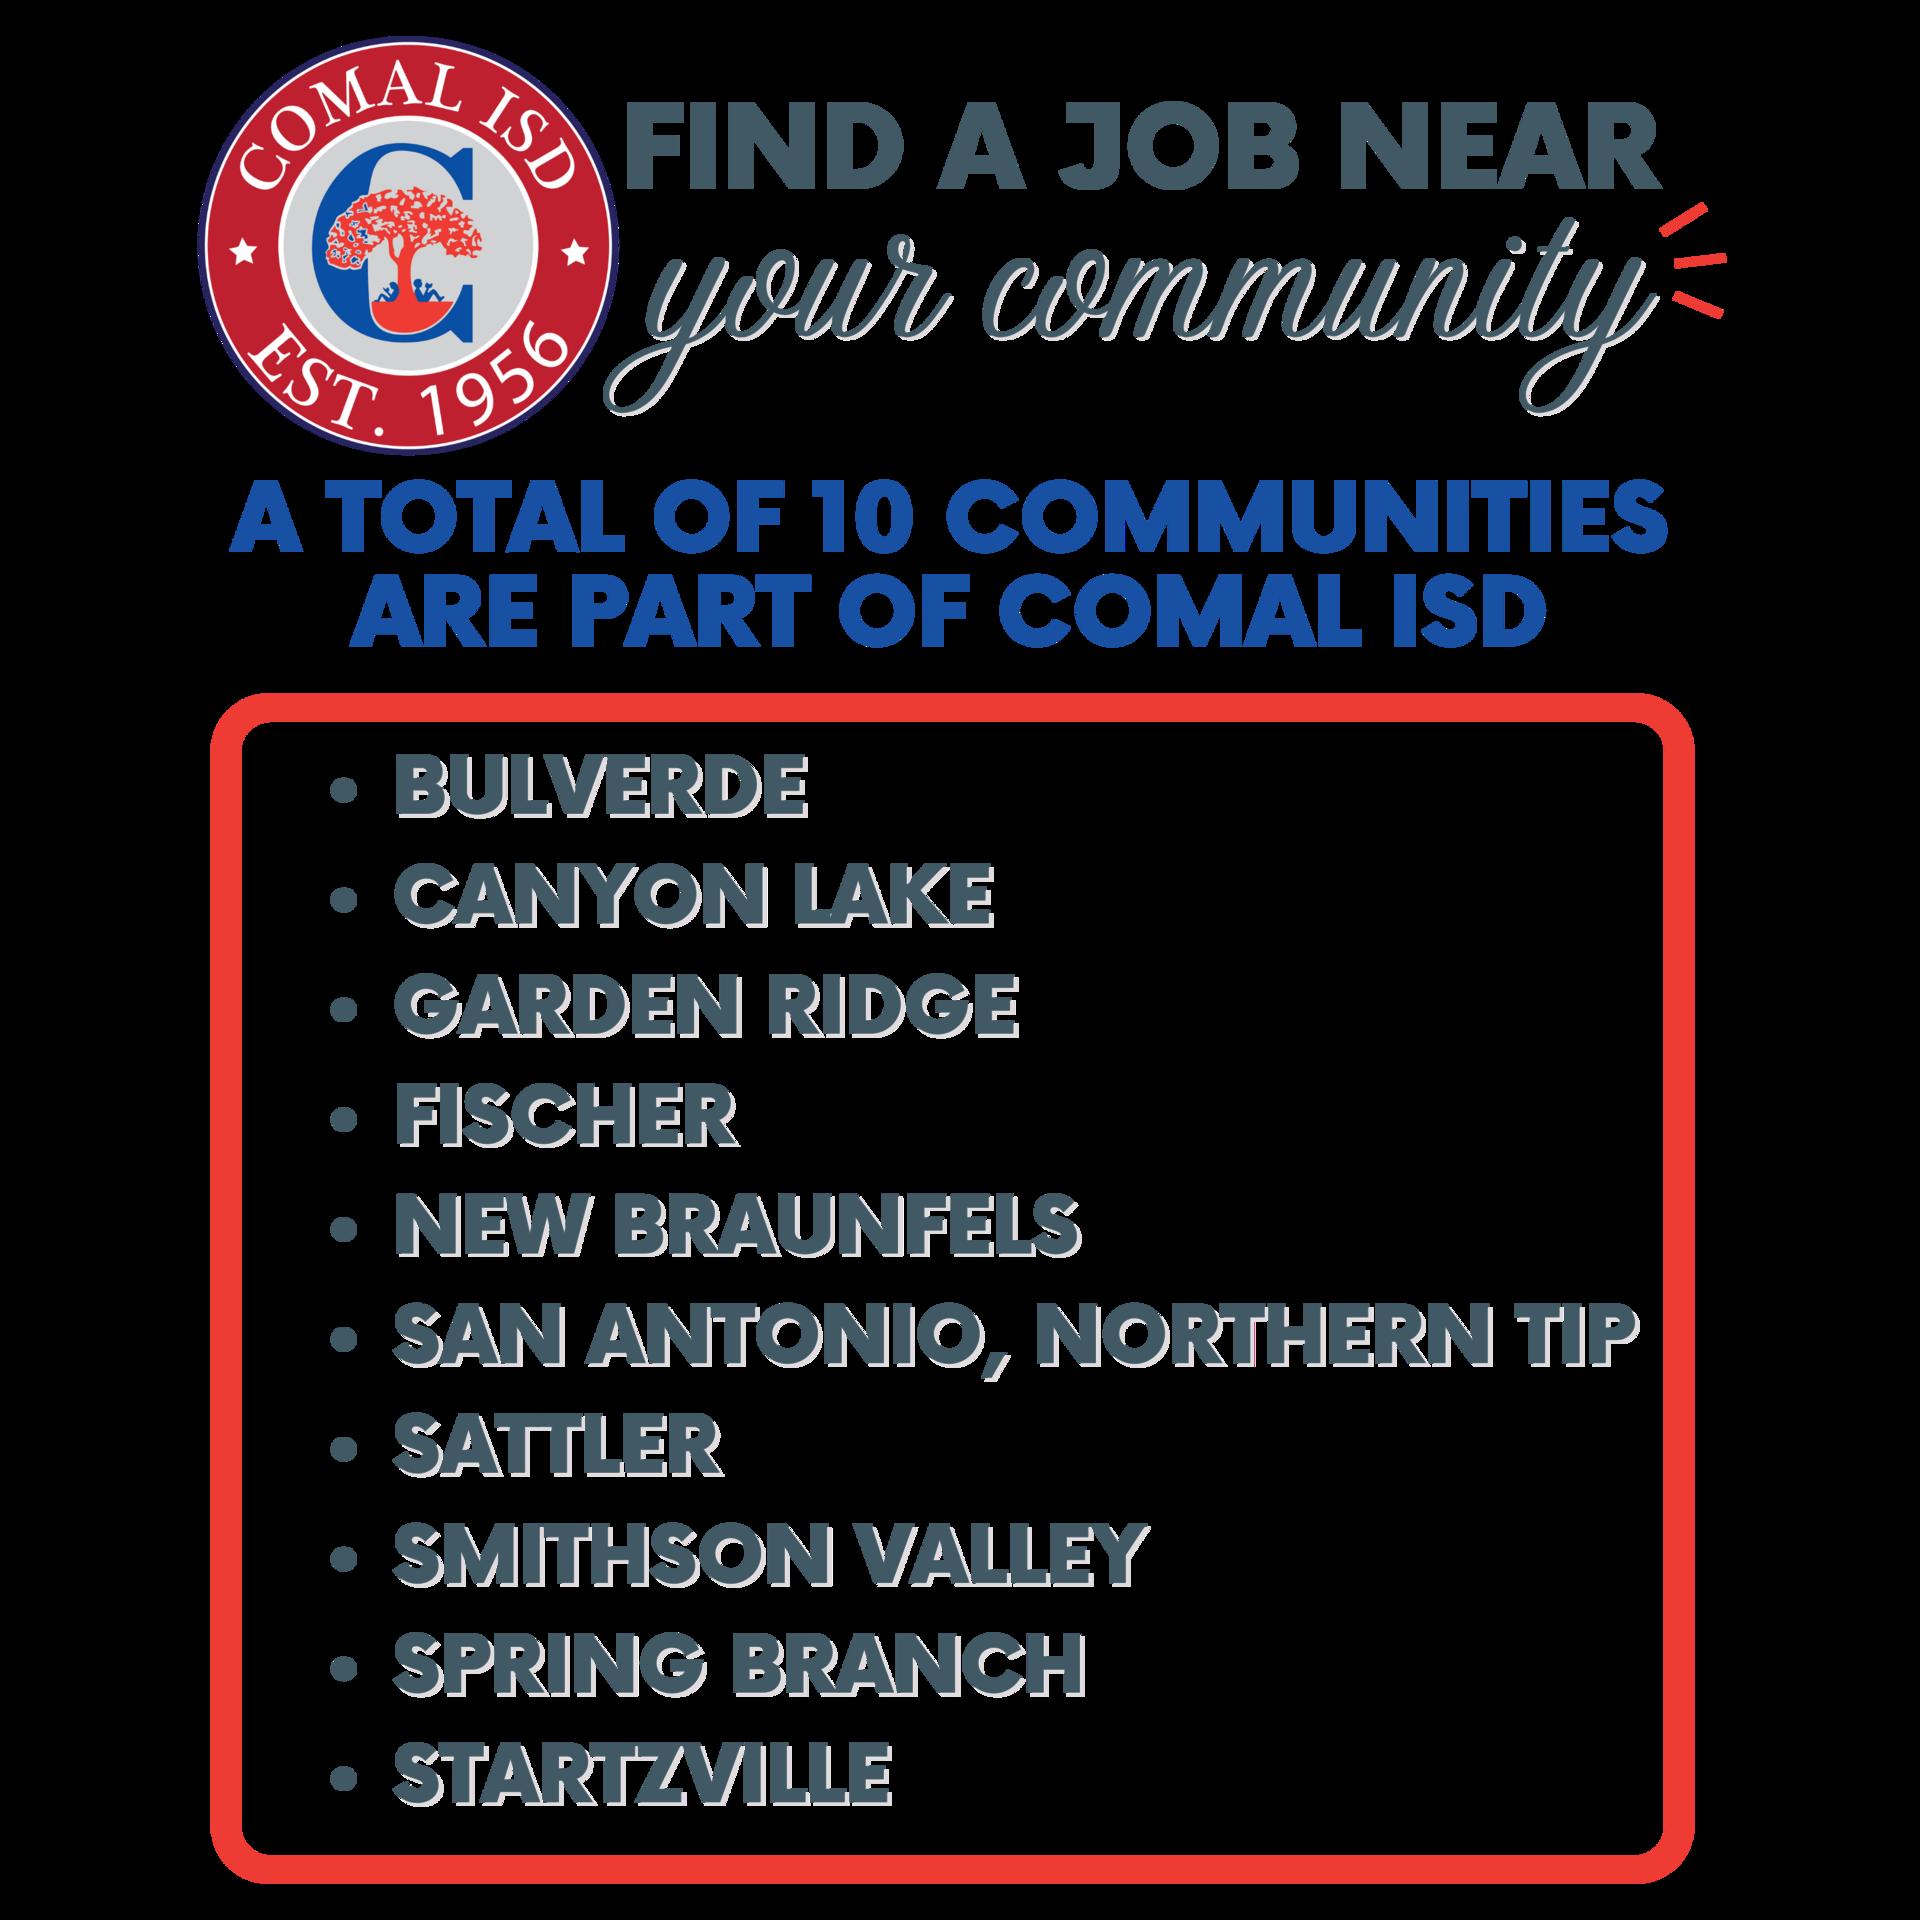 A job near your community